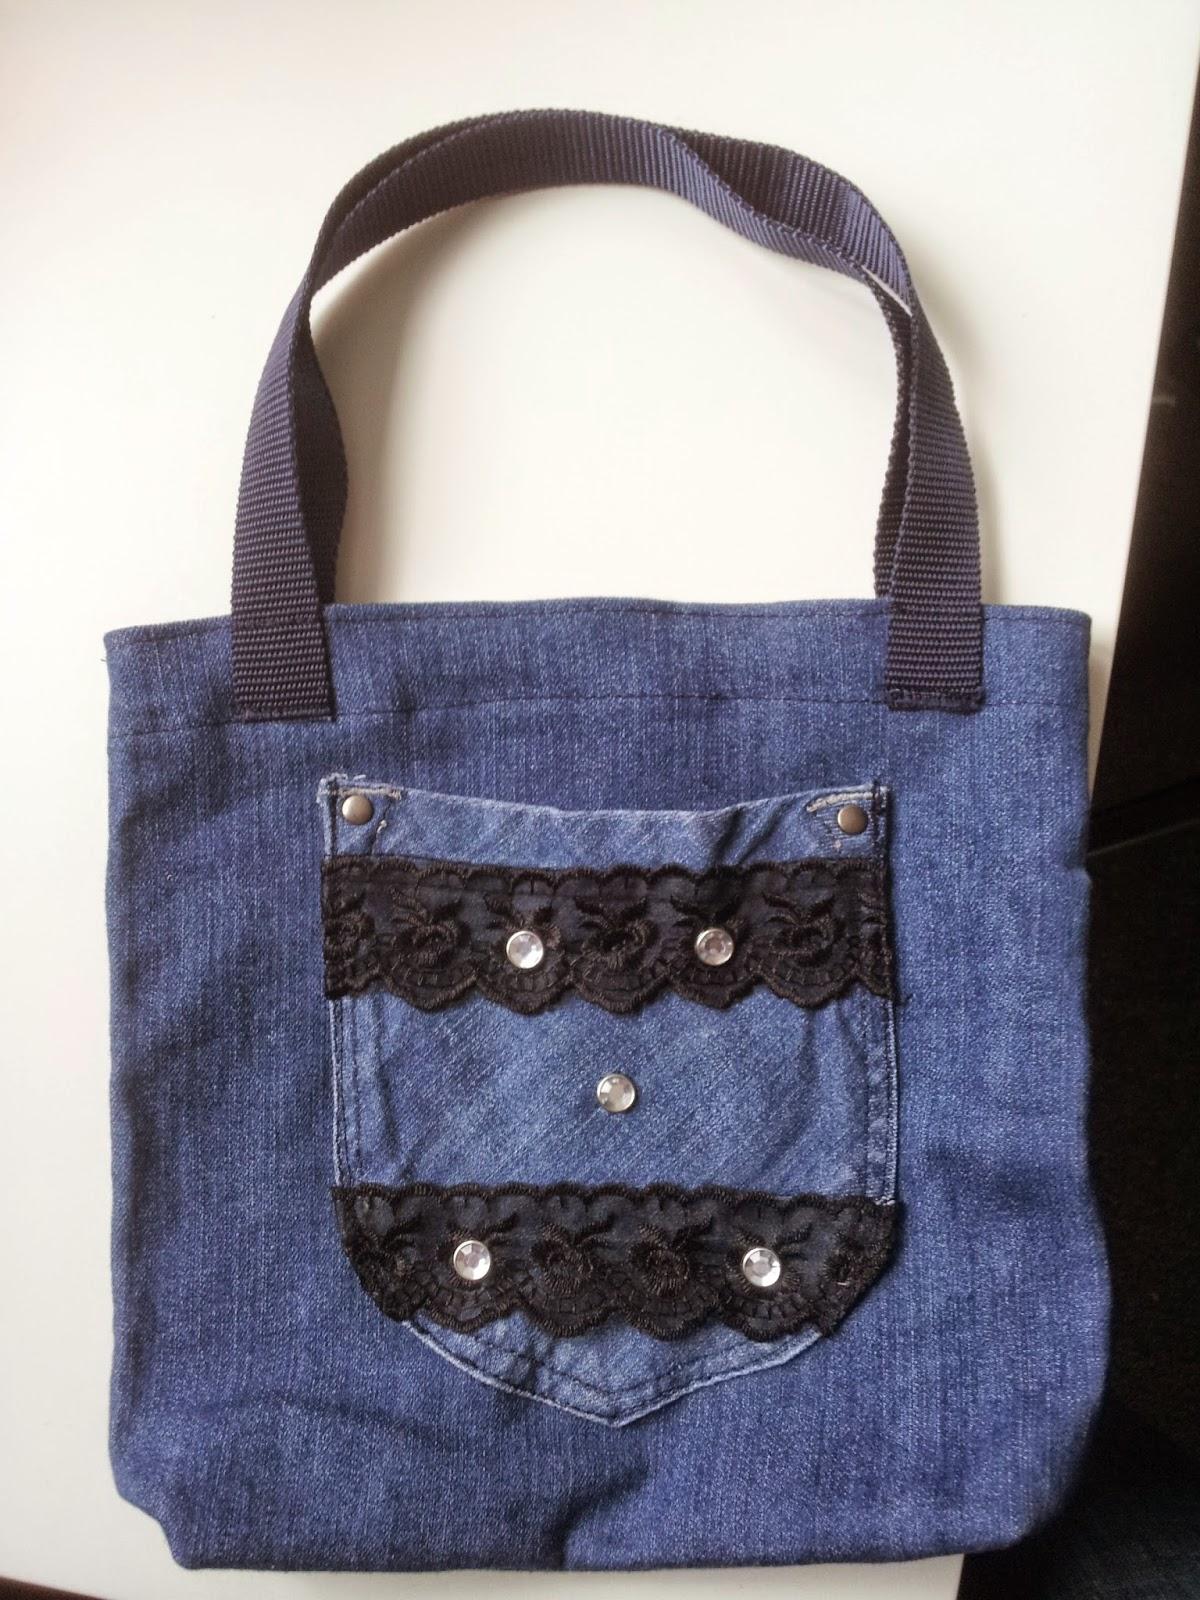 debbie mackay 39 s handmade kleine jeanstasche selber n hen. Black Bedroom Furniture Sets. Home Design Ideas